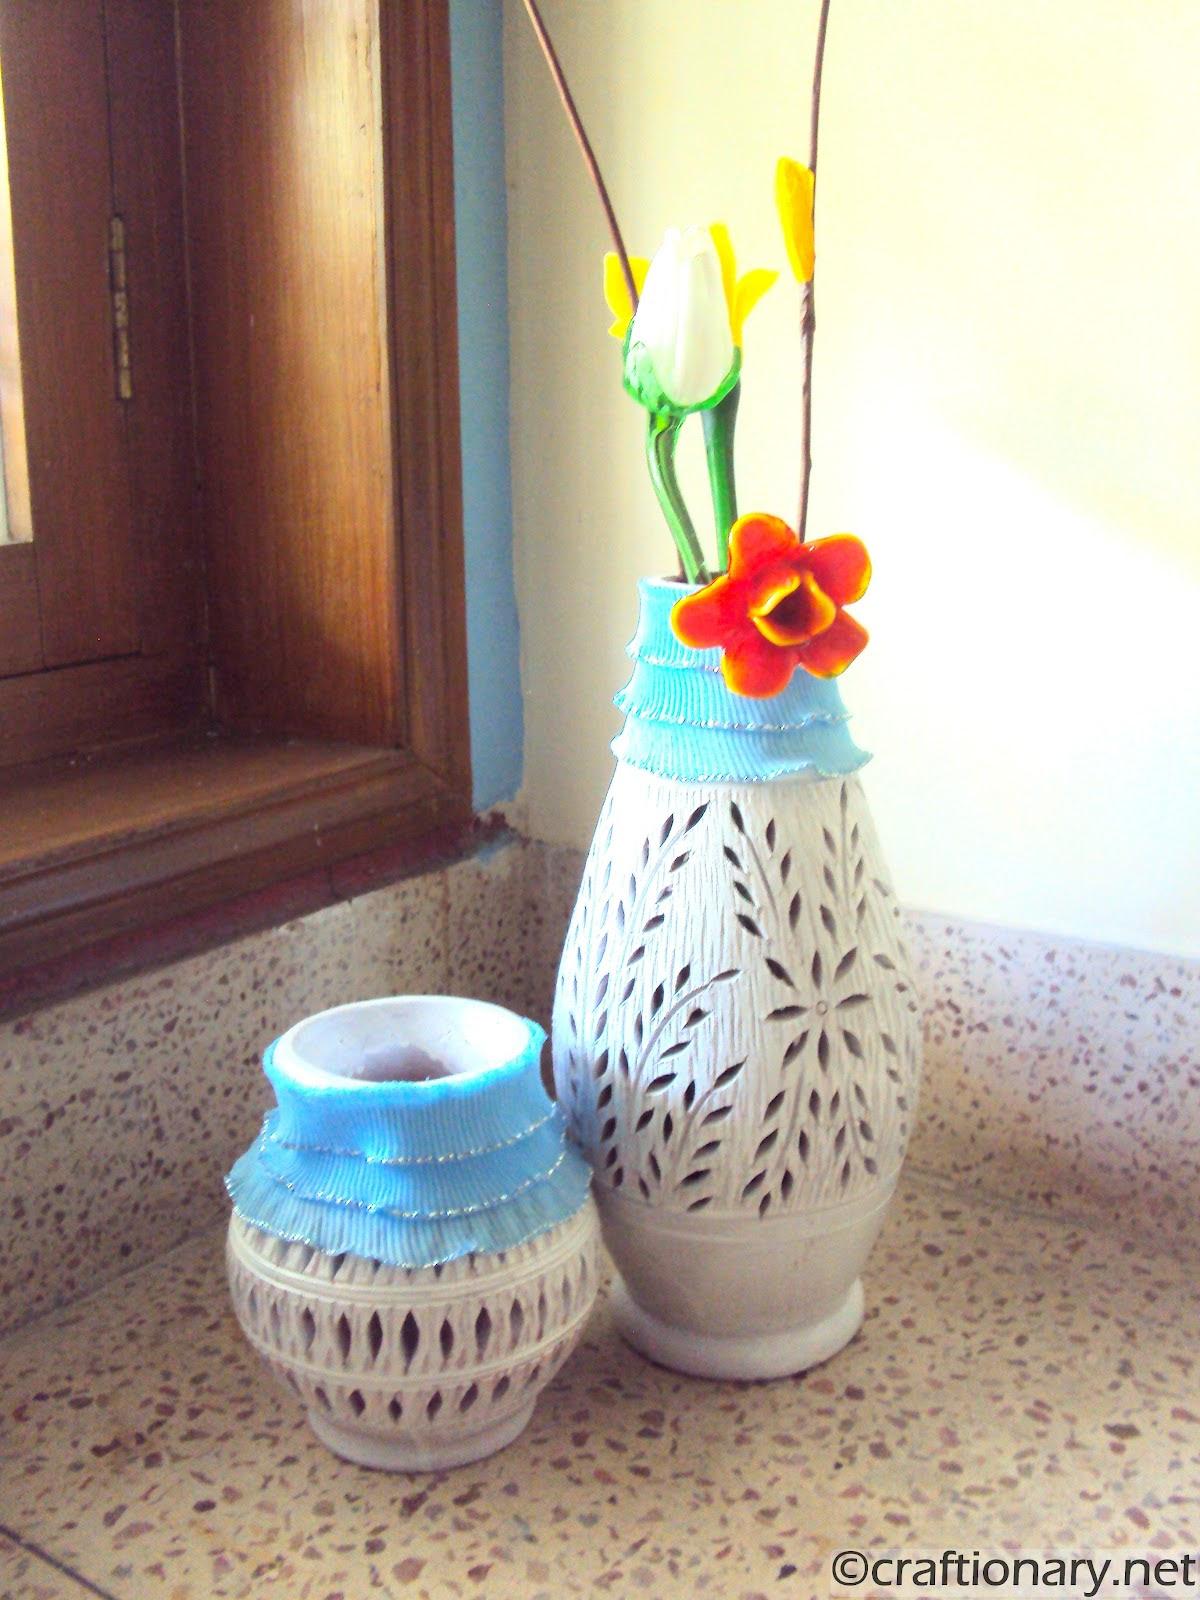 DIY Clay Pots (Decorating Home) - Craftionary